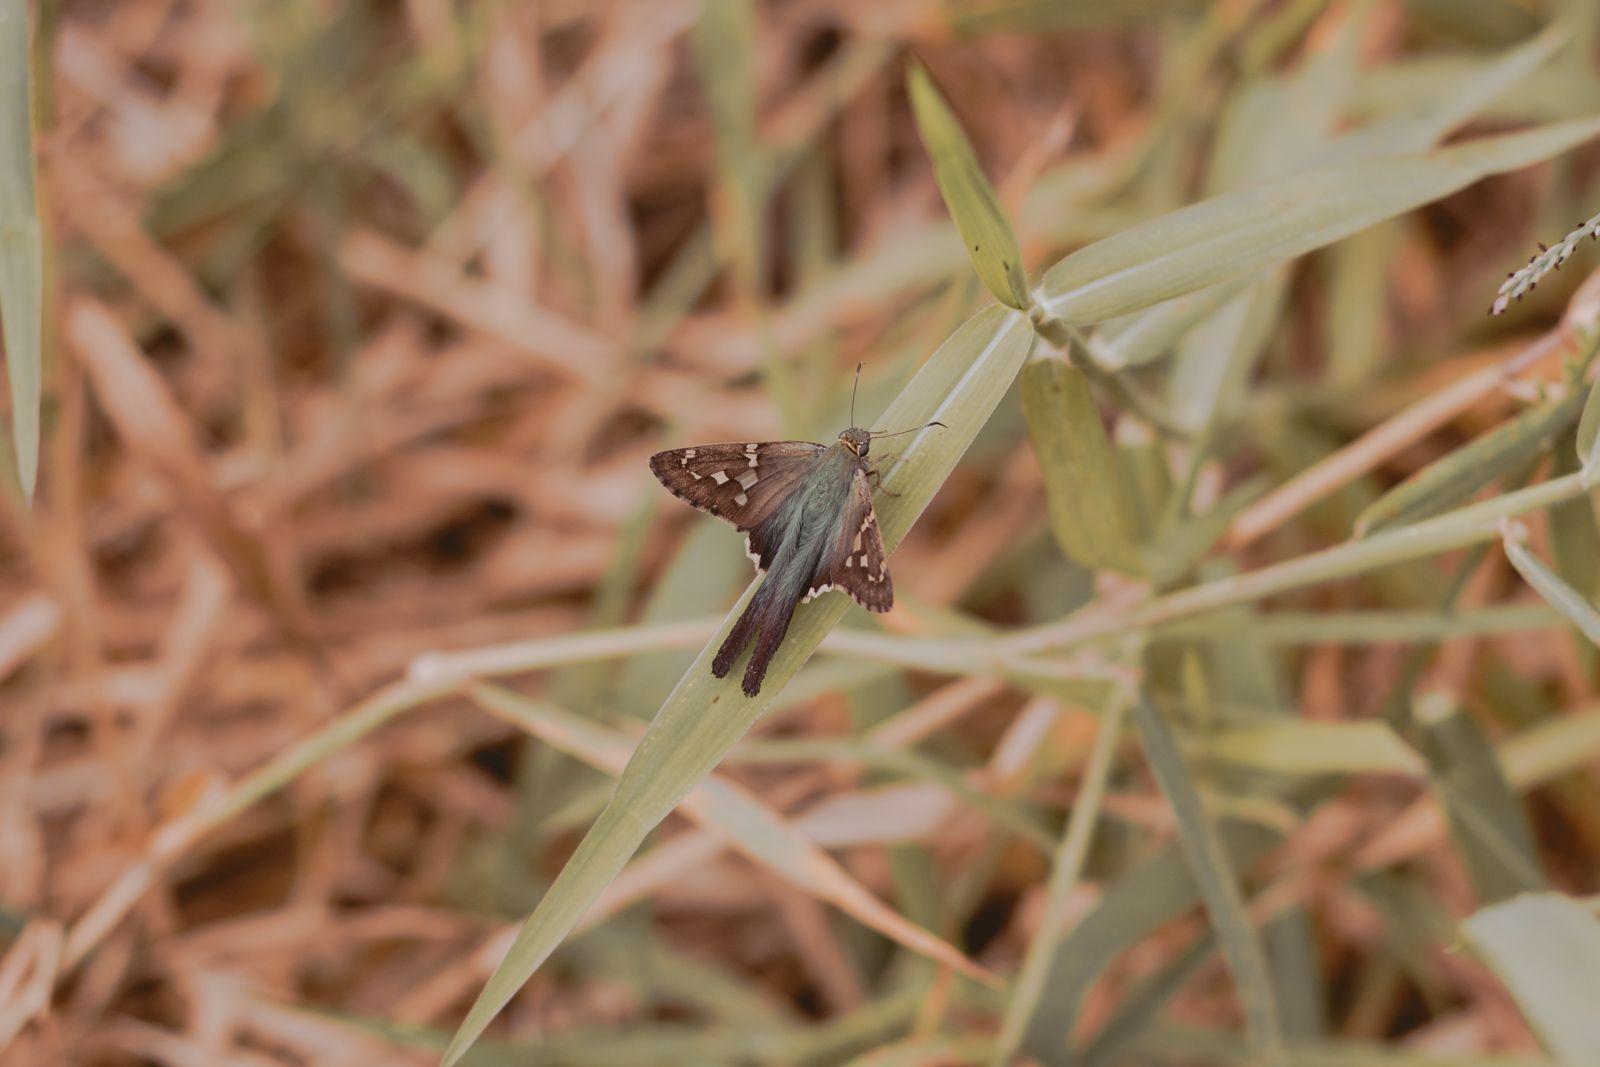 inseto parado na grama